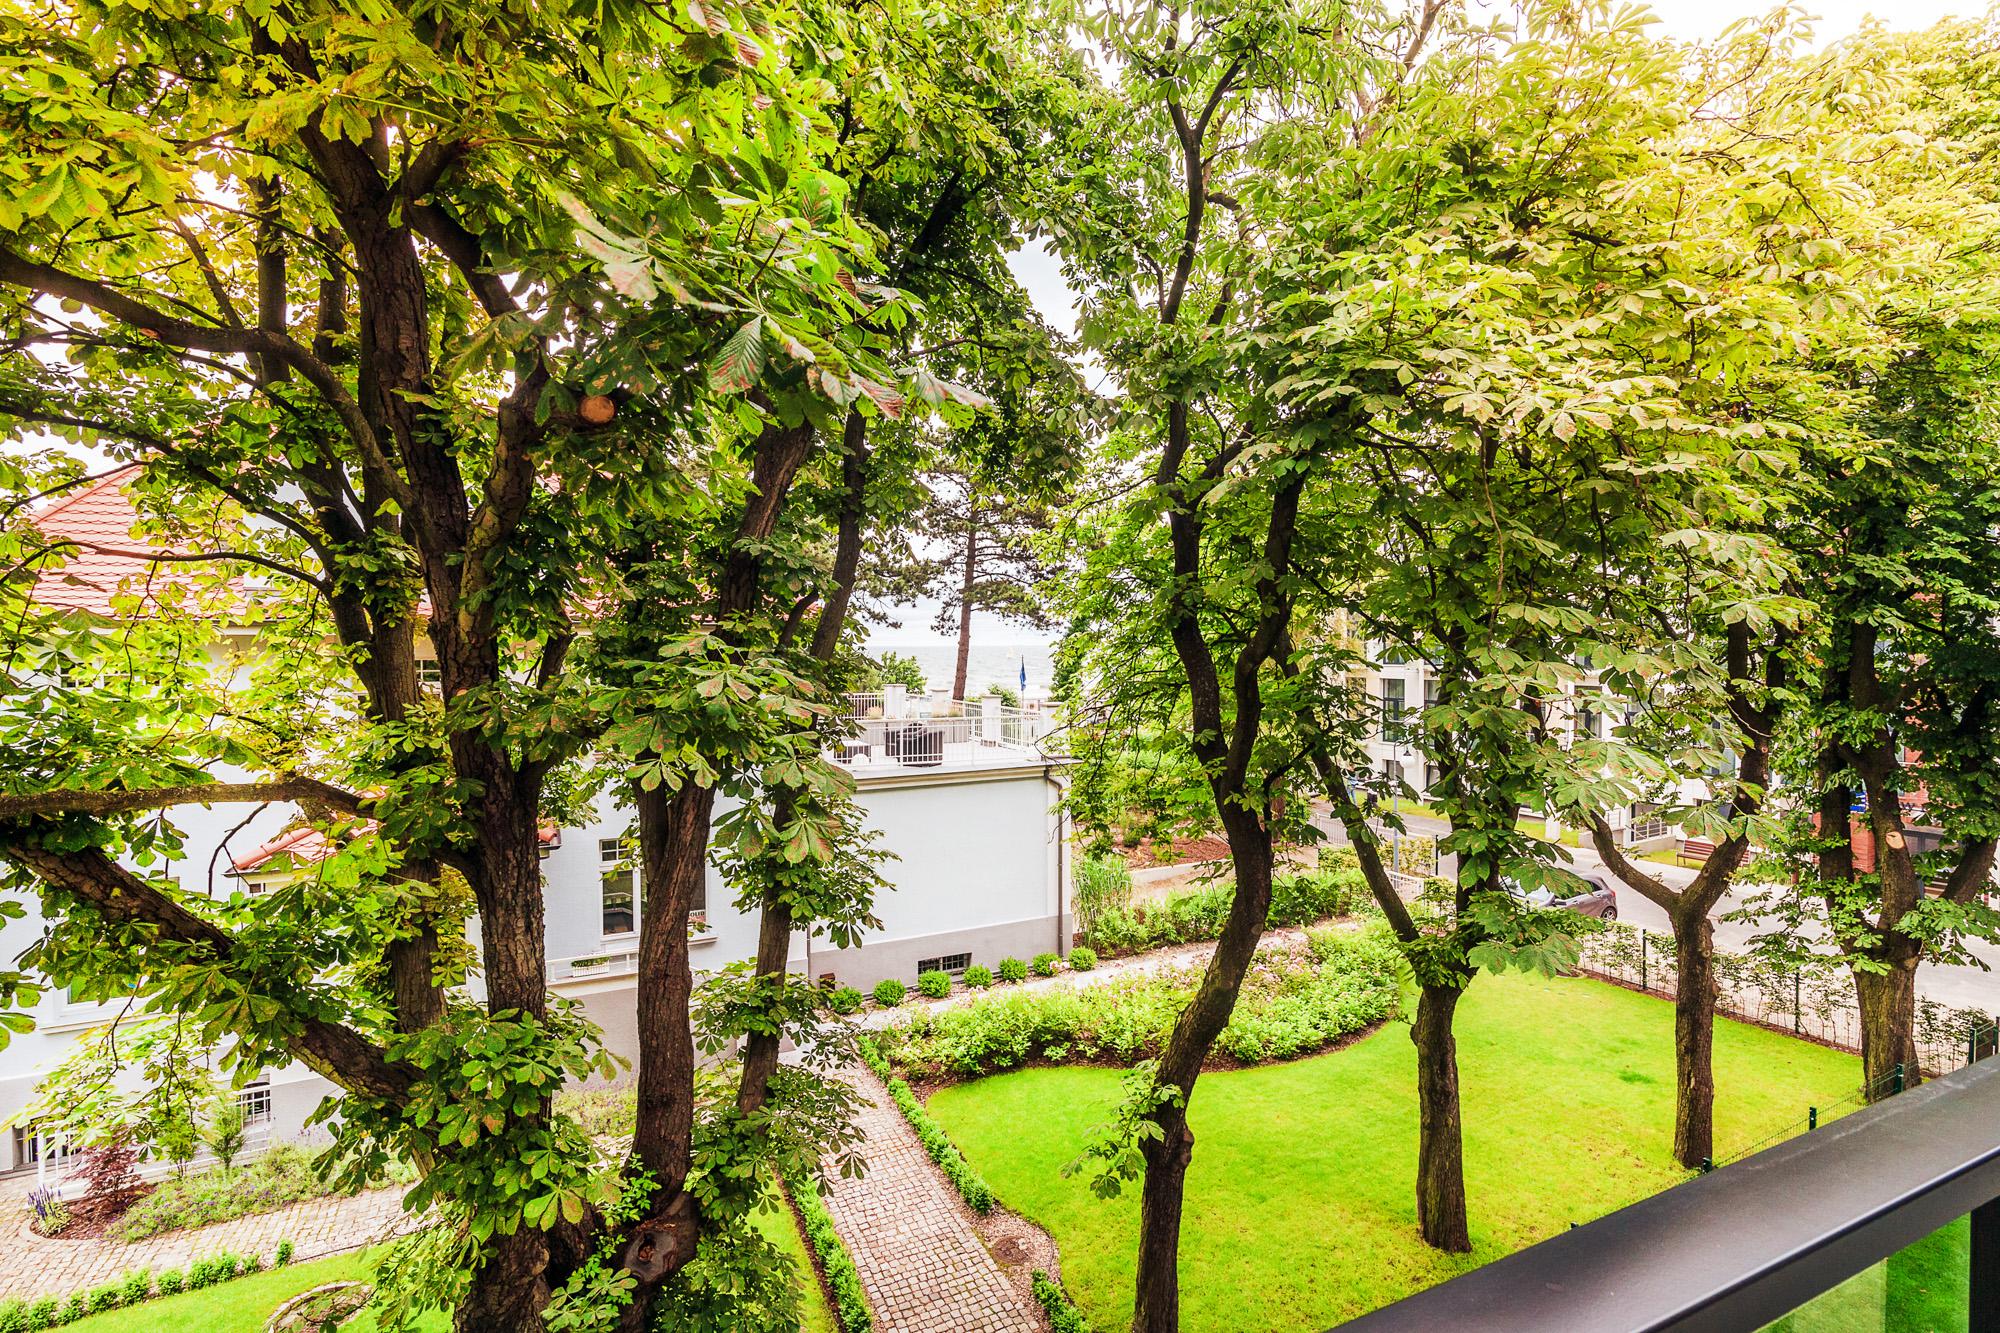 Hotel Testa - Ogród